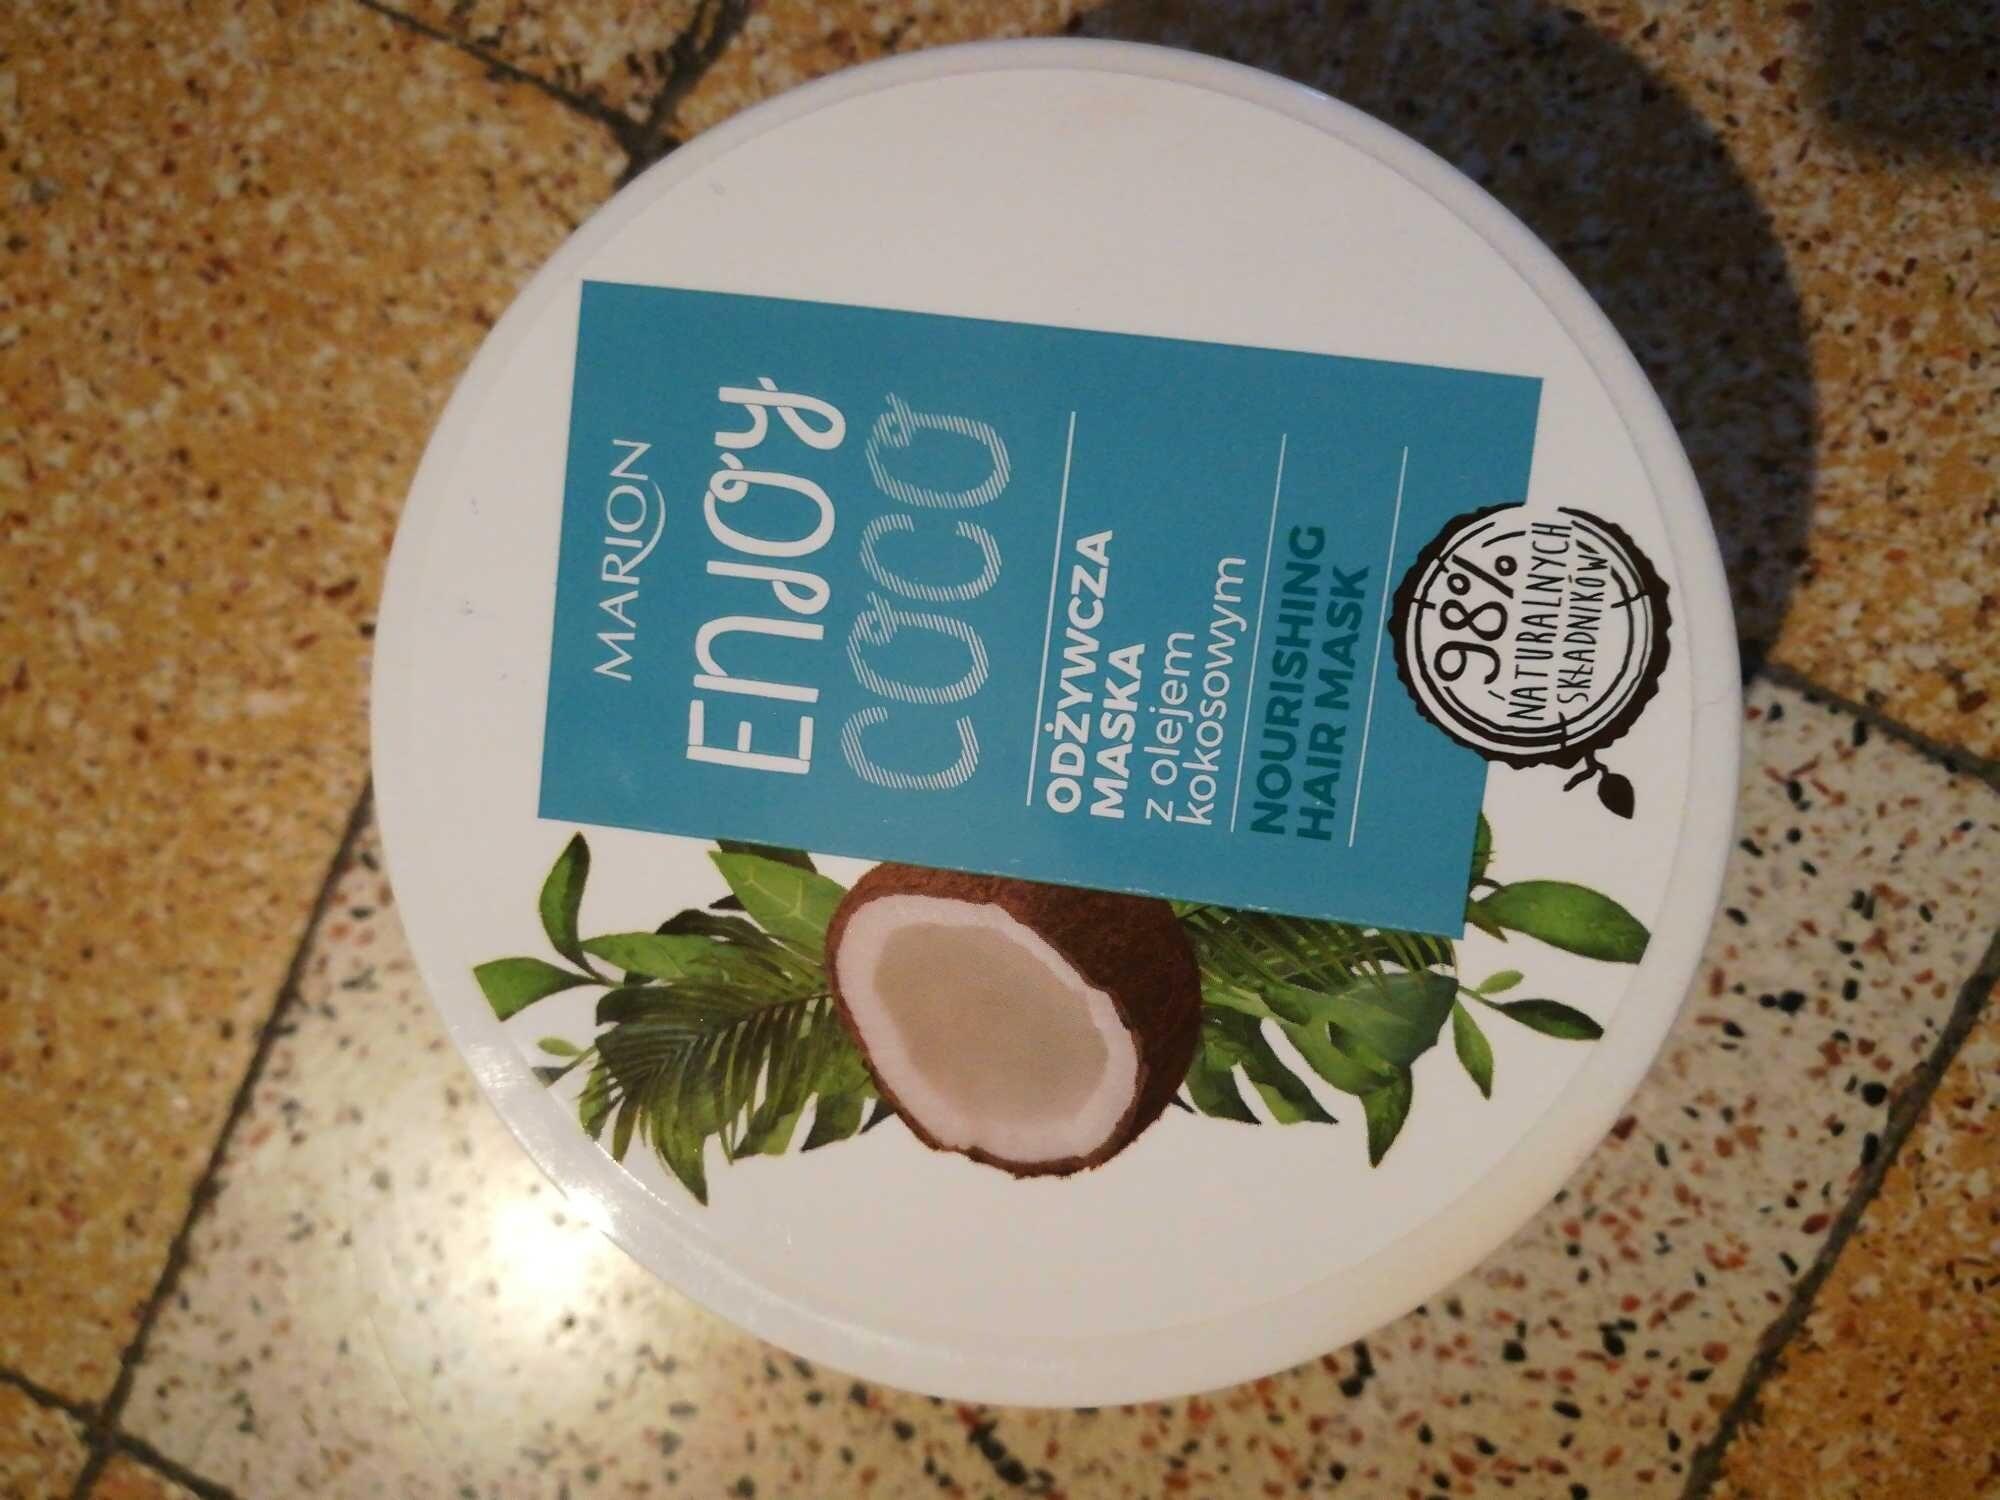 Enjoy coco - Product